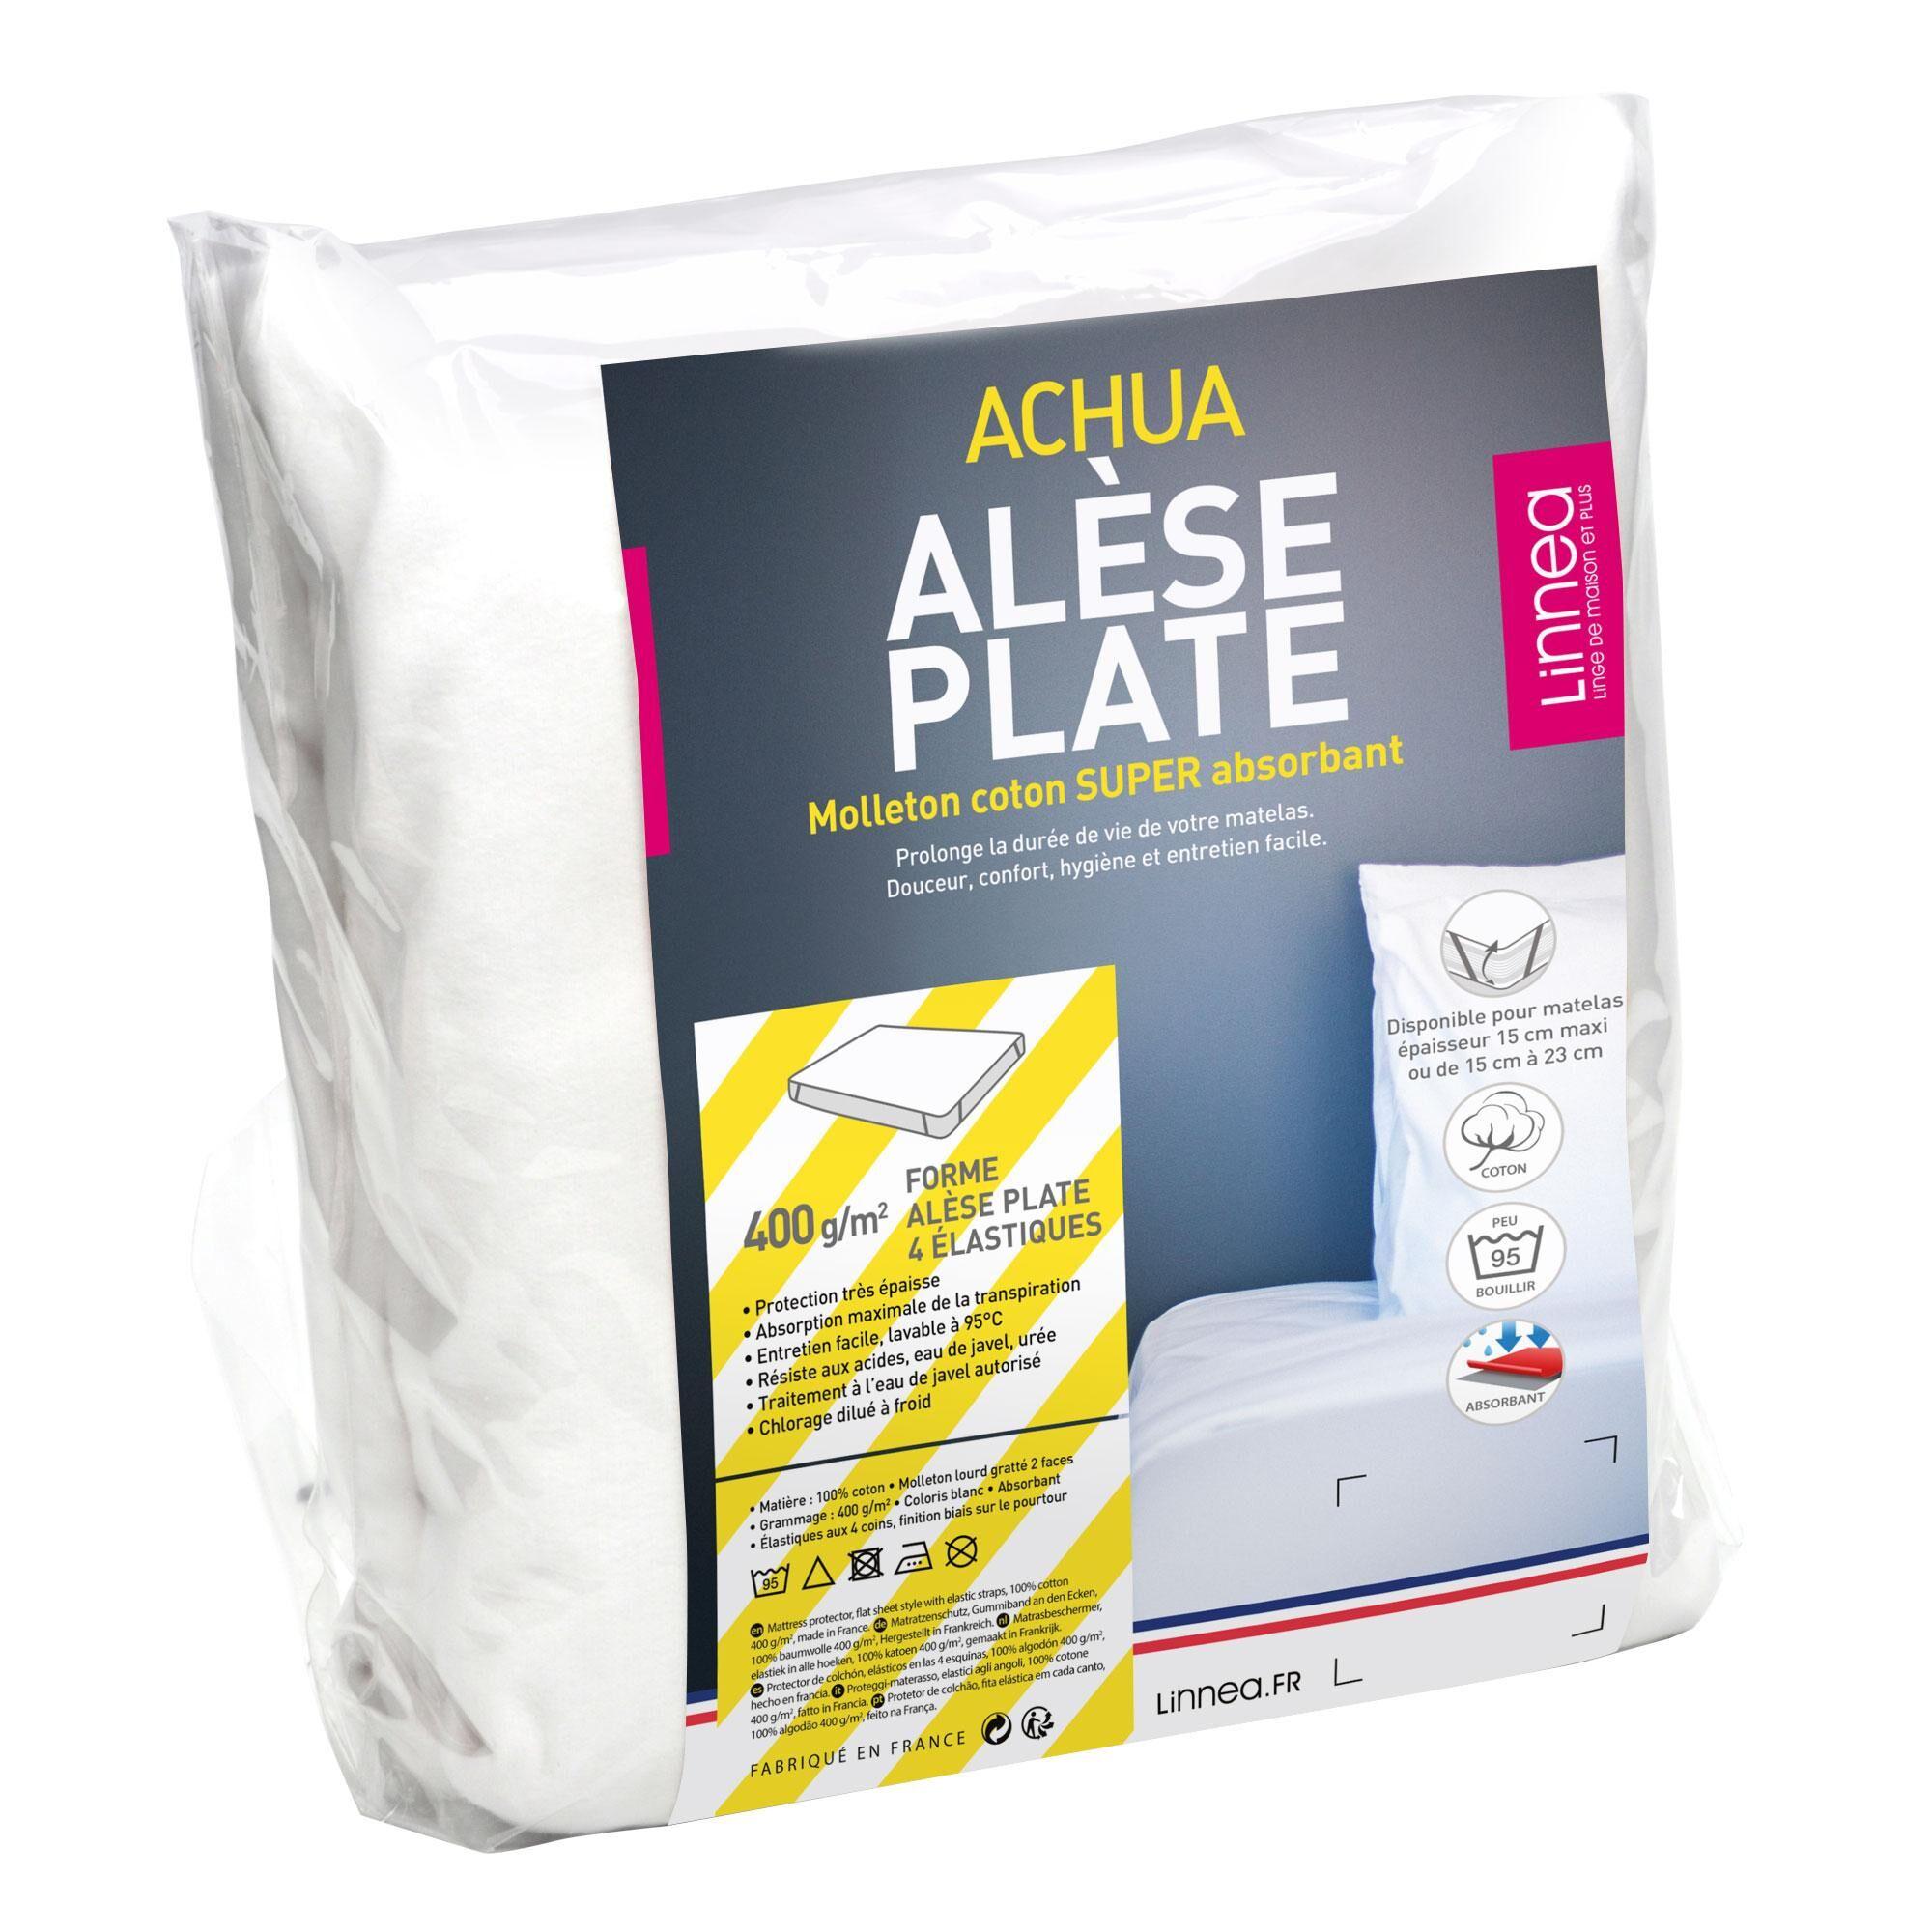 Linnea Alèse plate 70x140 cm ACHUA Molleton 100% coton 400 g/m2 matelas 15cm maxi